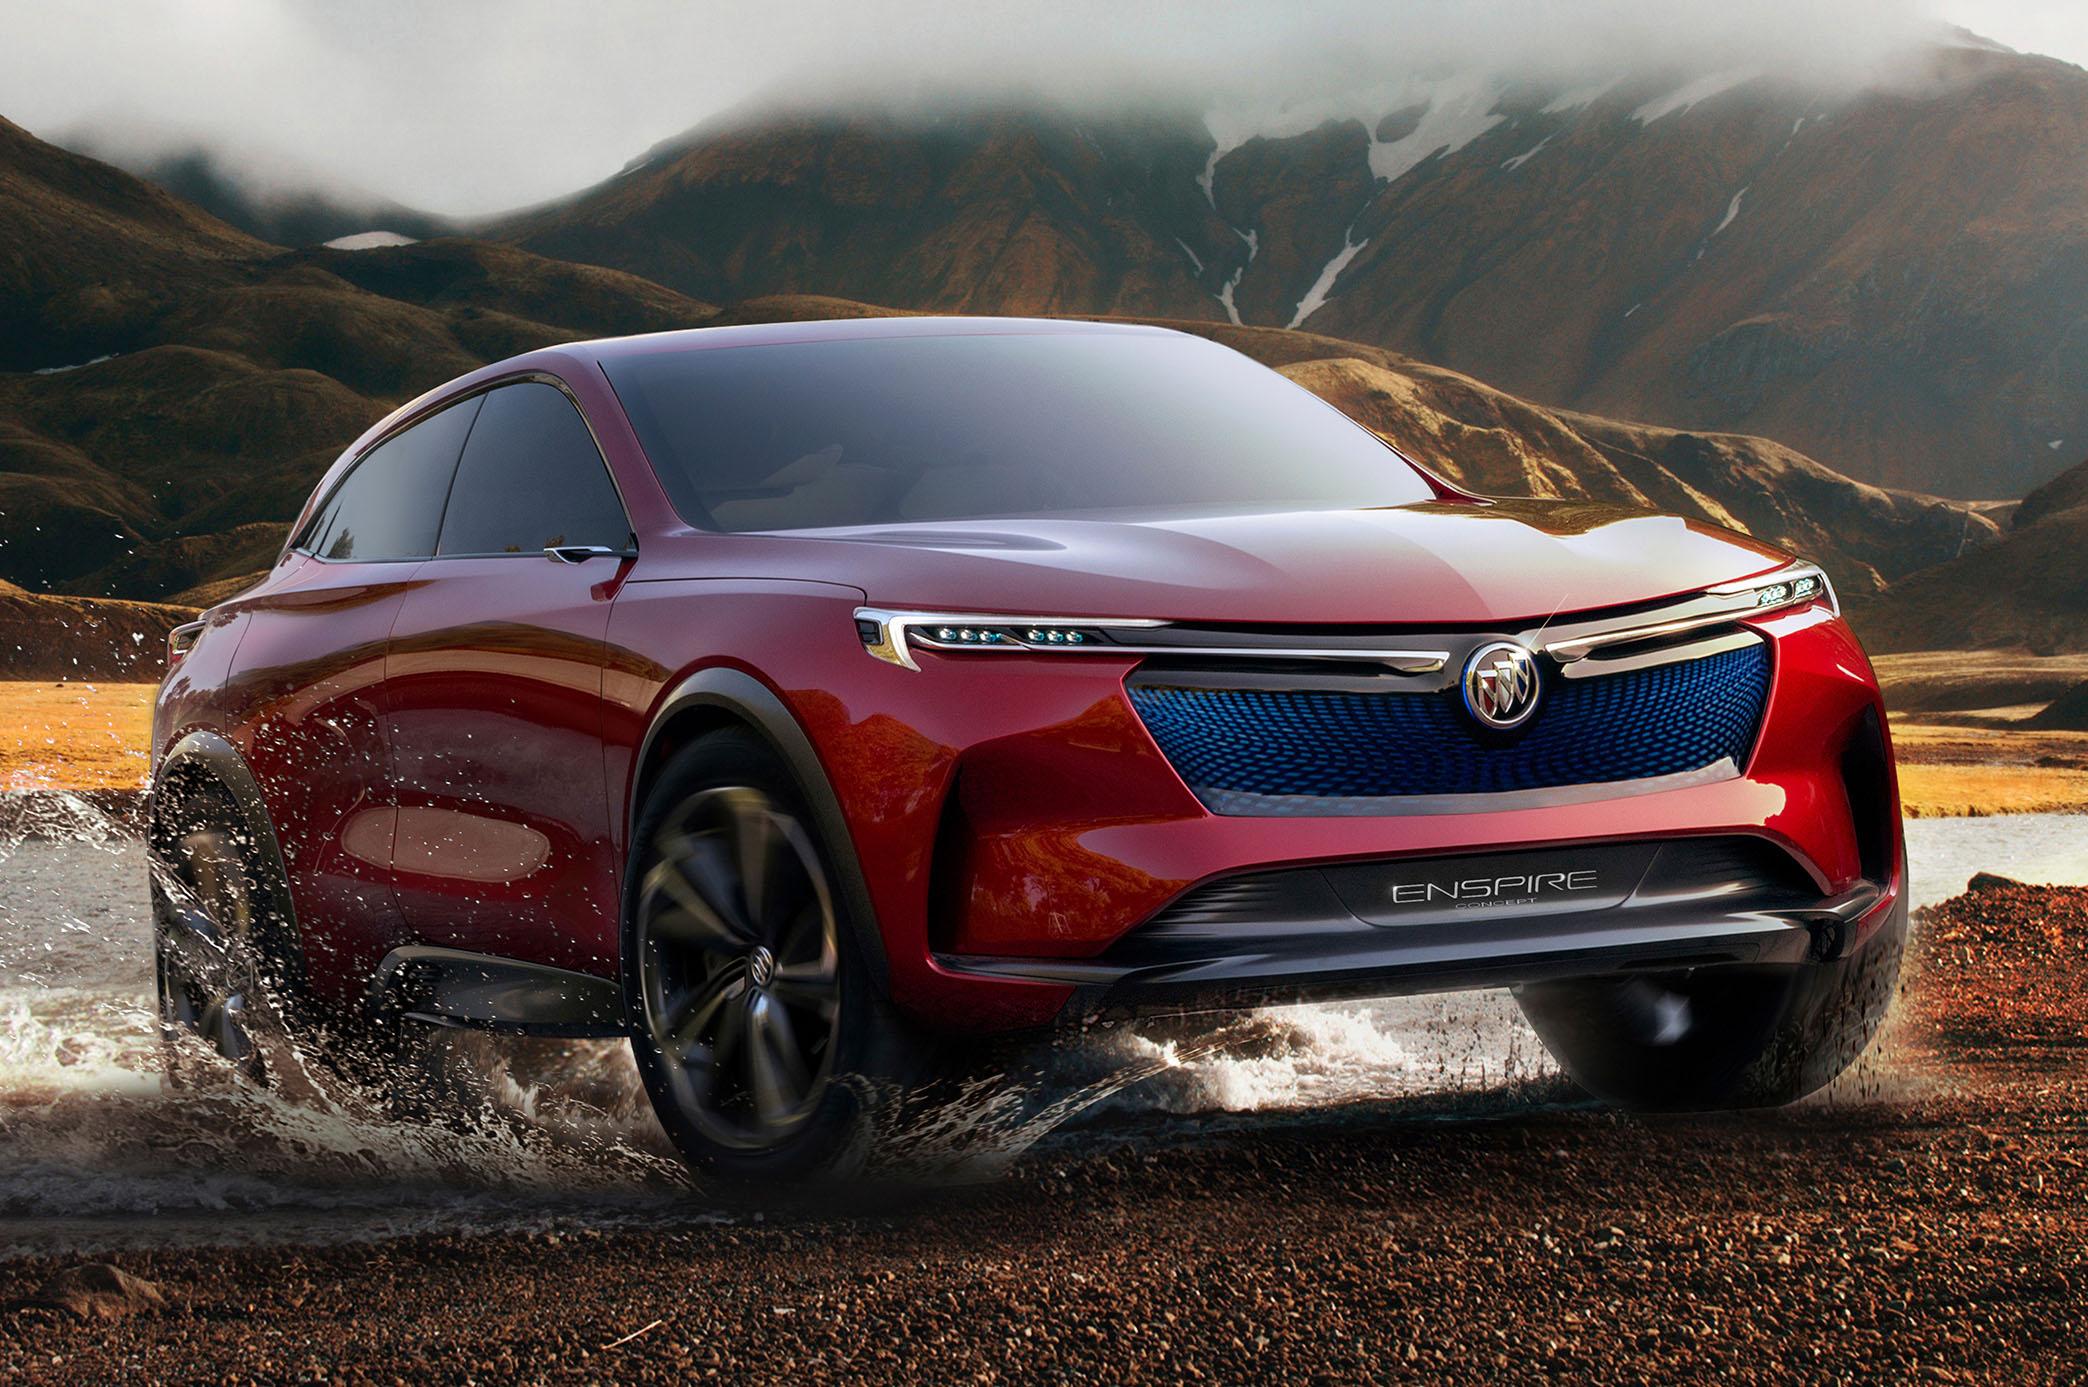 Buick Enspire Concept Front Three Quarter